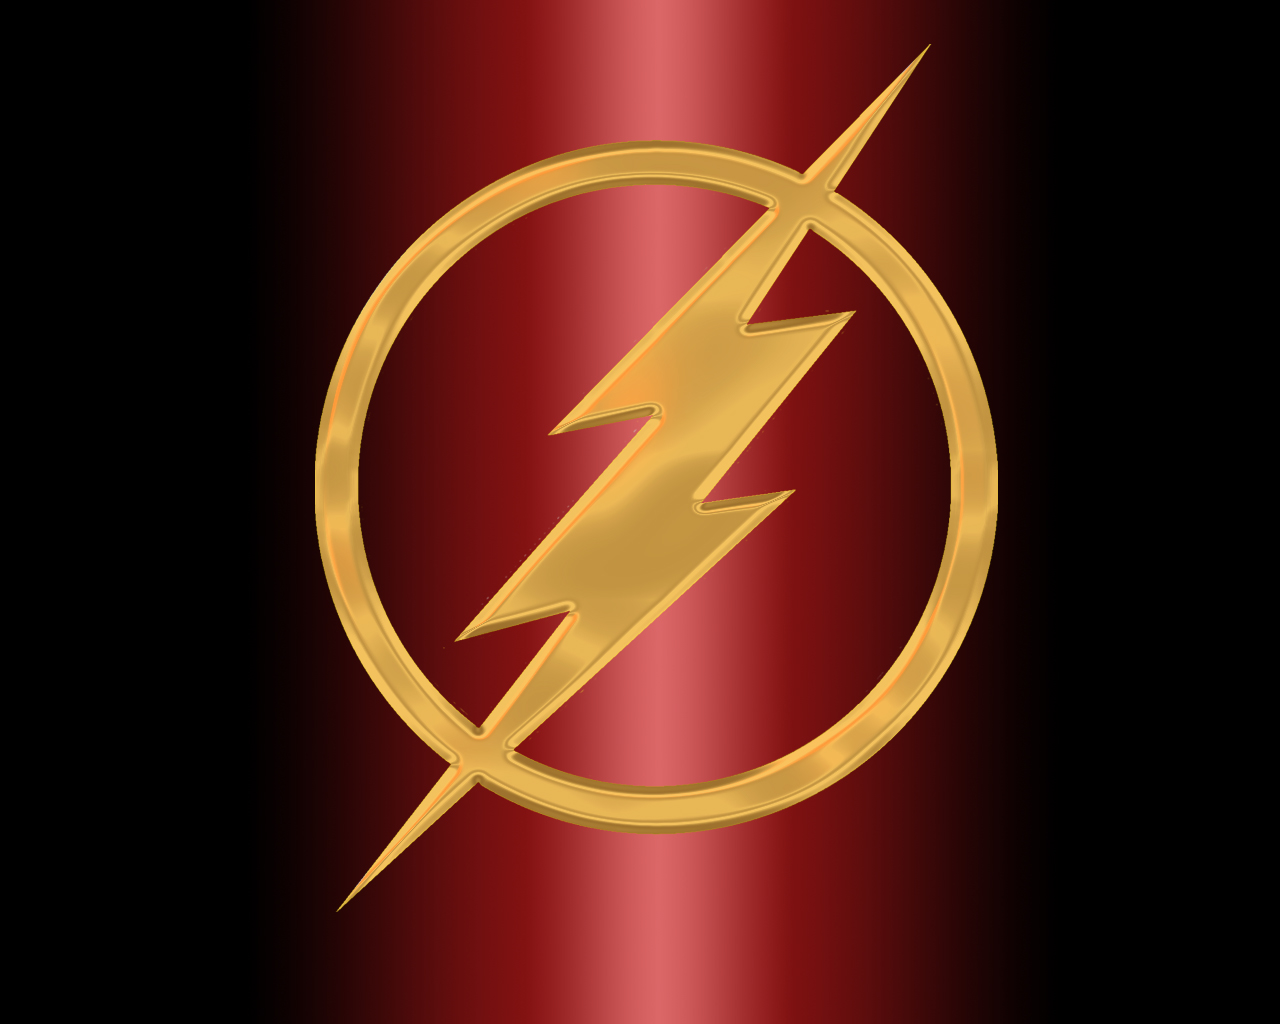 COMING SOON The Flash Origins of The Scarlett Speedster 1280x1024